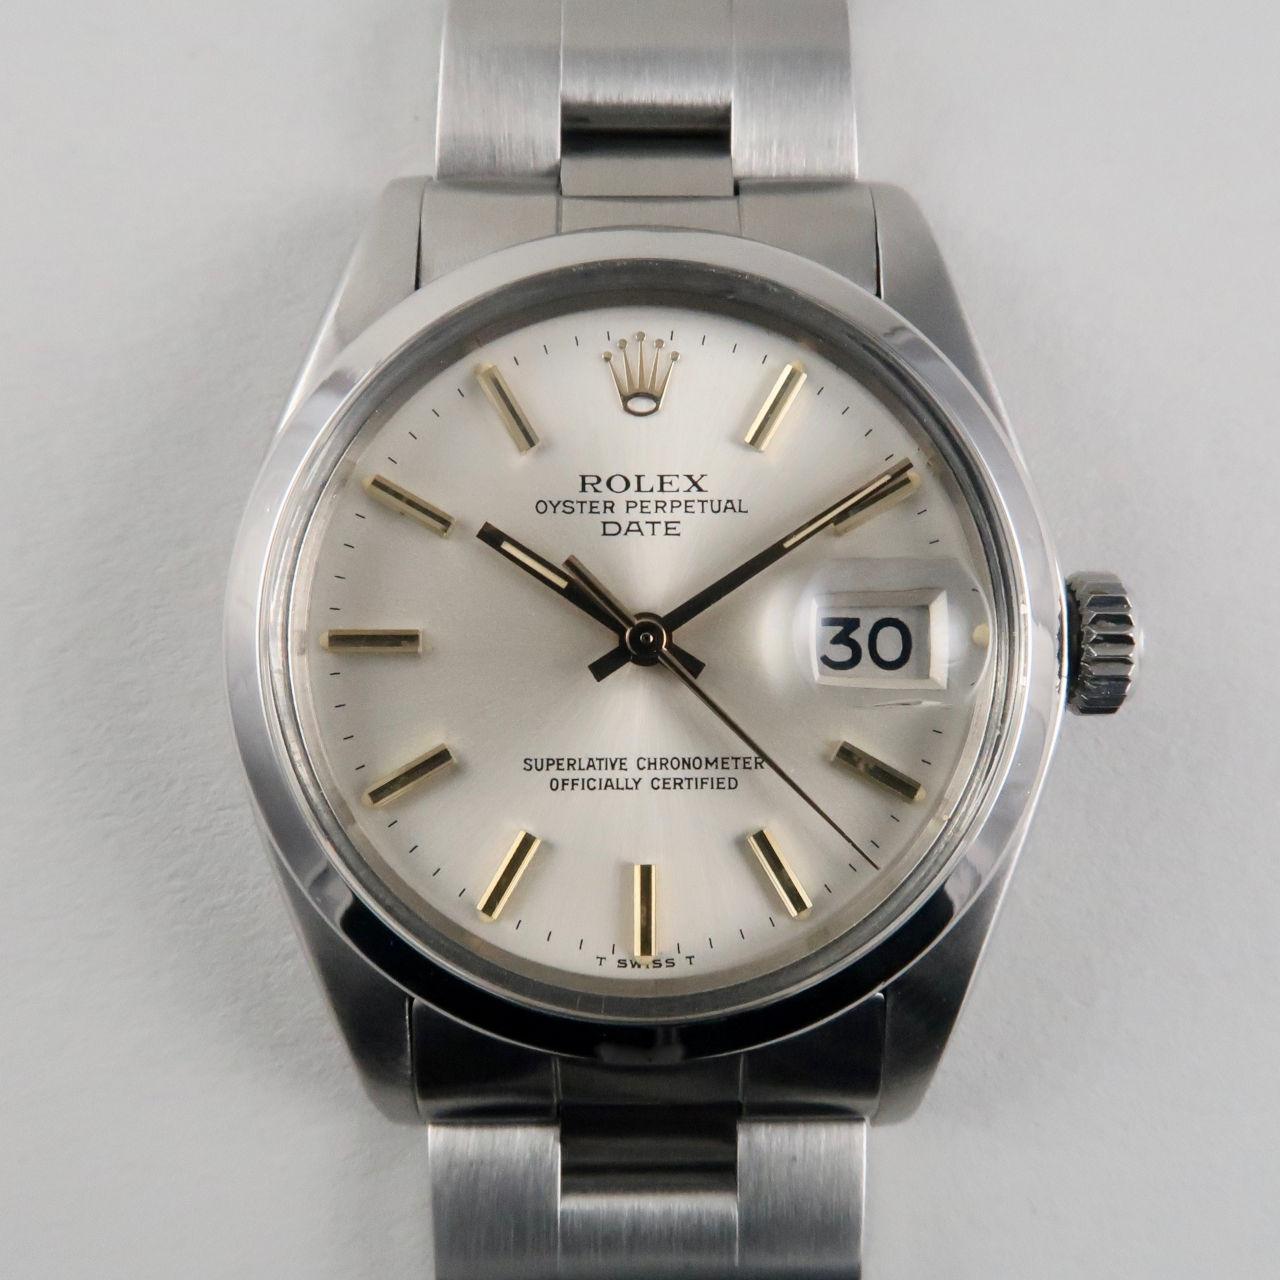 Rolex Oyster Perpetual Date Ref.1500 steel vintage wristwatch, circa 1974